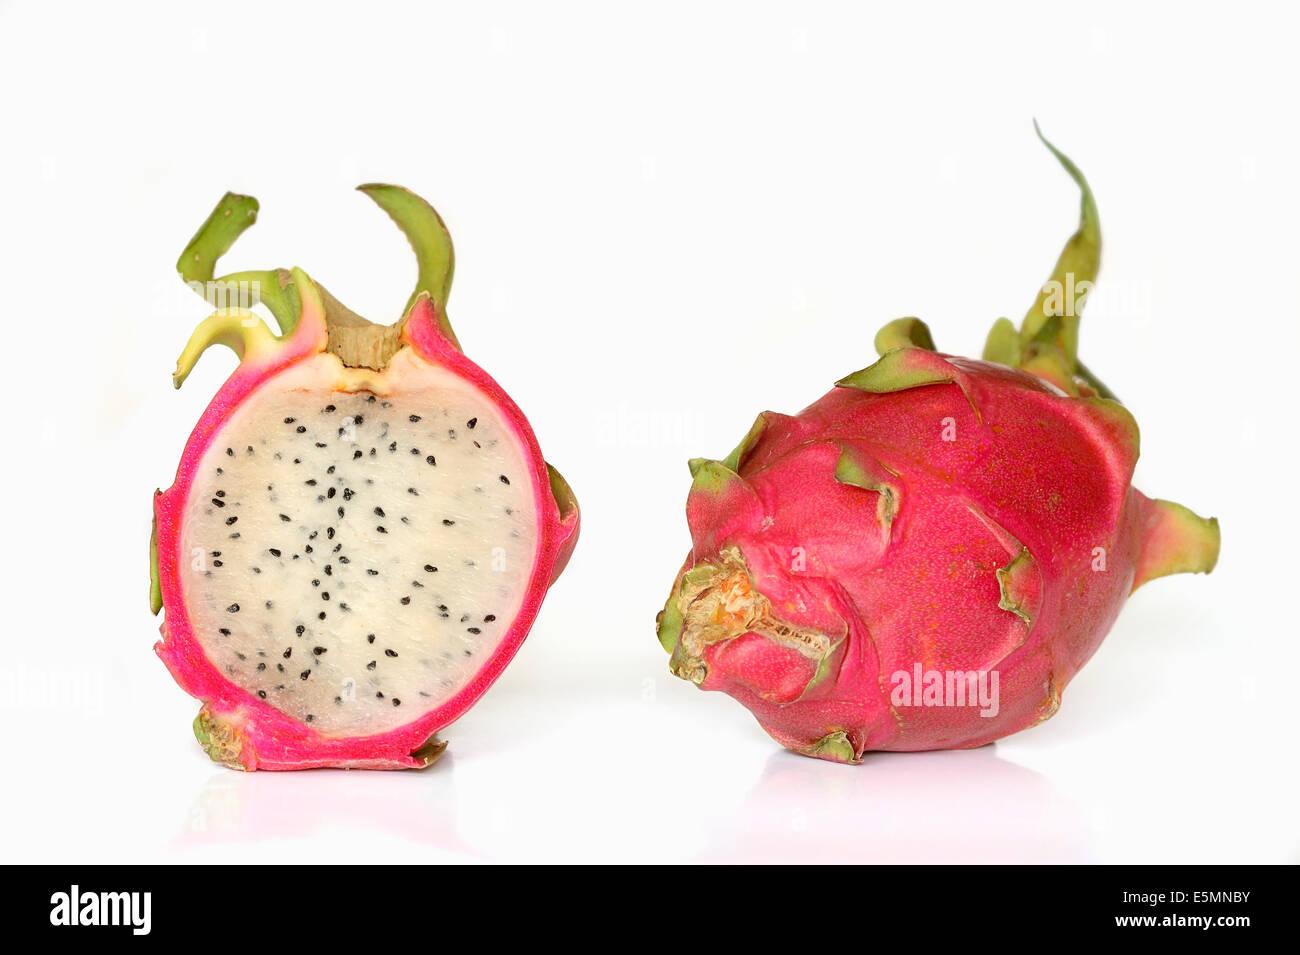 Red Dragon Fruit or Red Pitahaya (Hylocereus undatus) - Stock Image